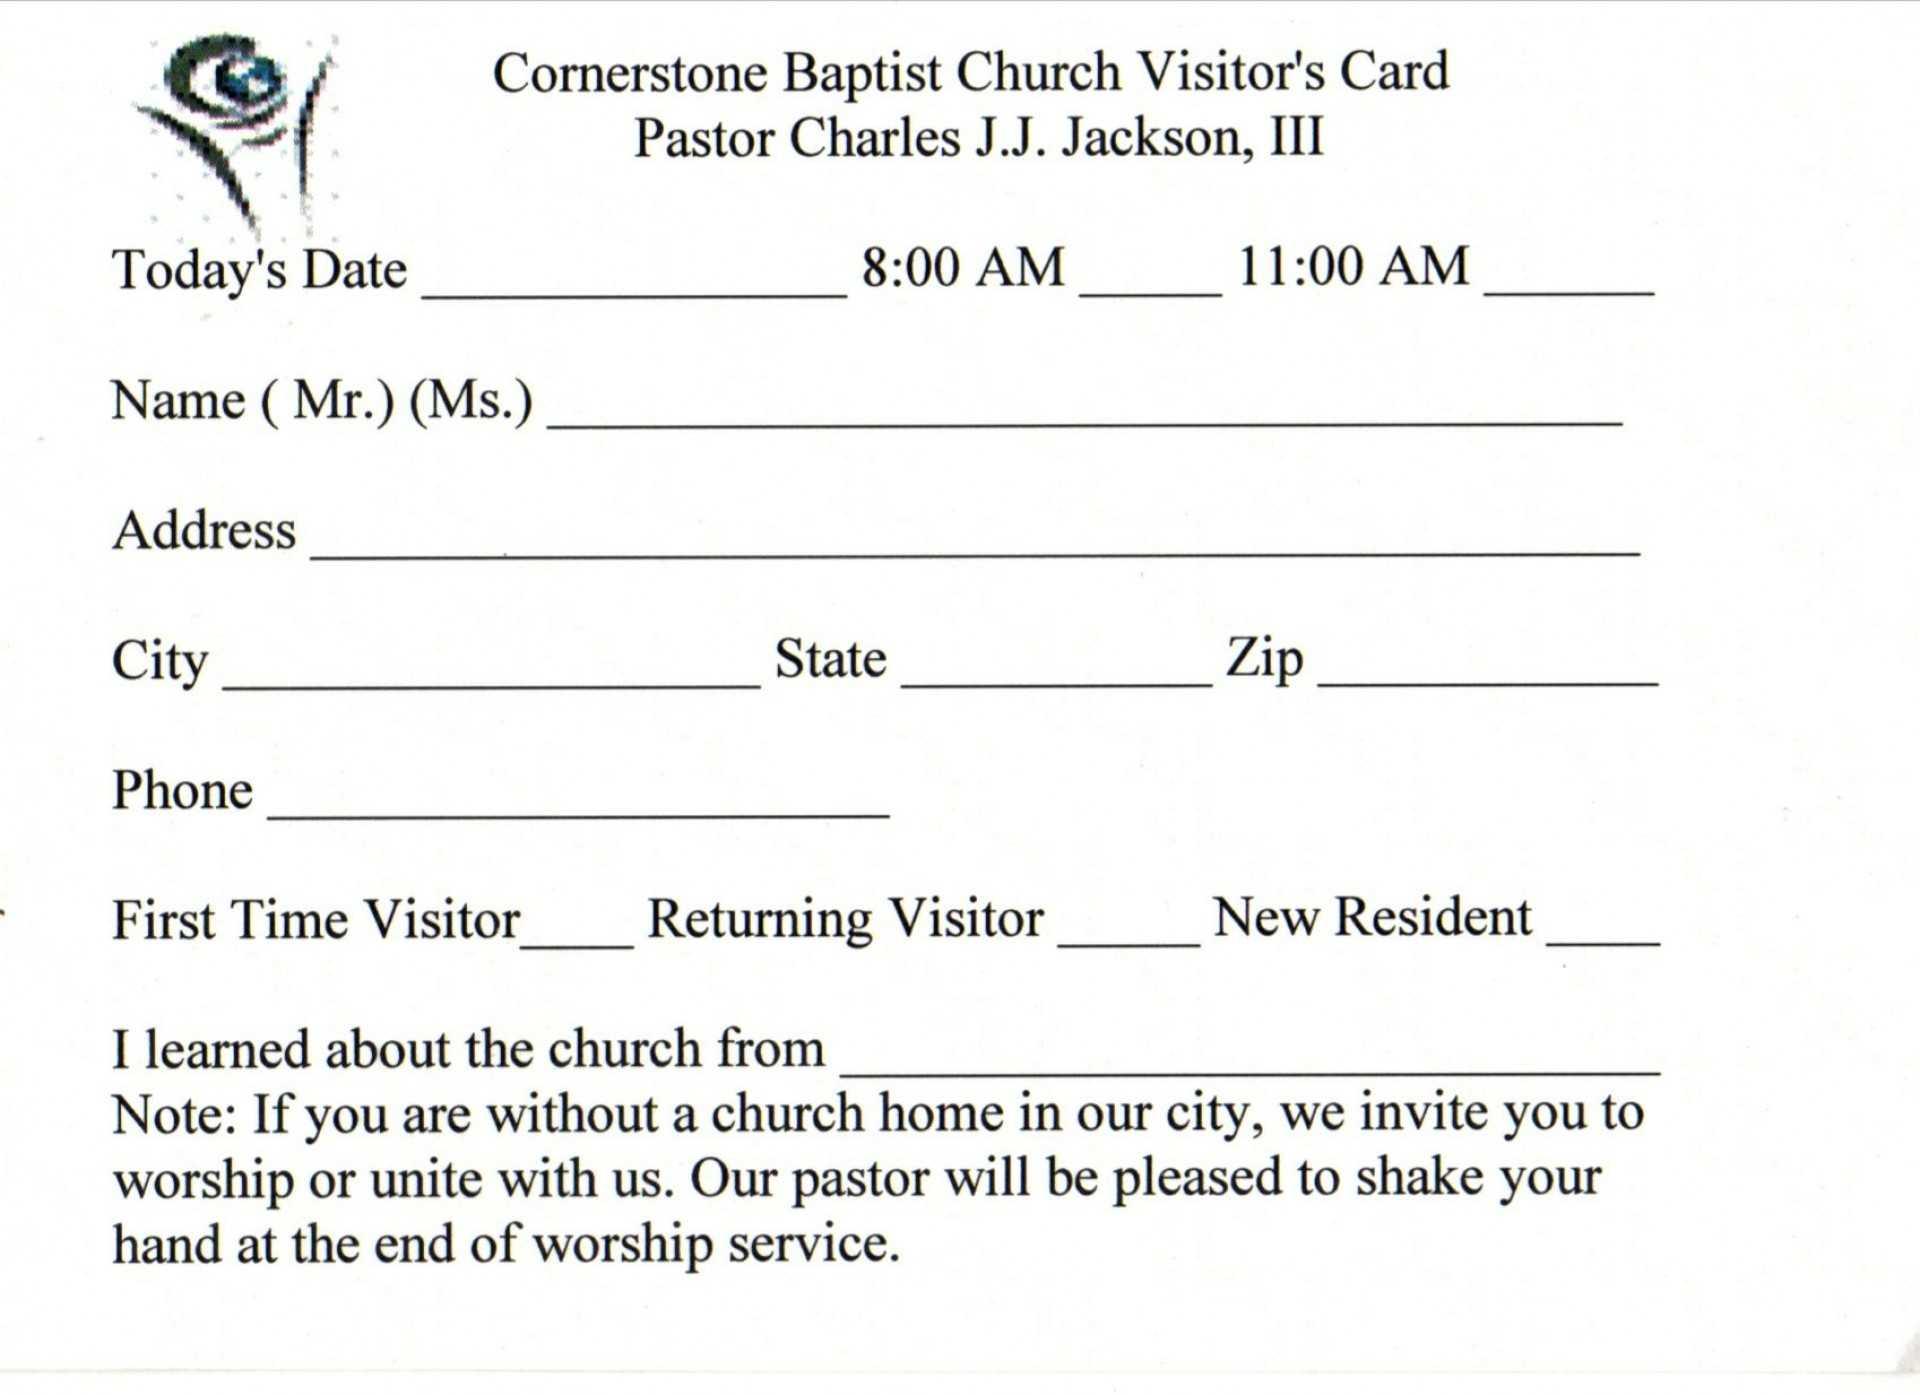 019 Template Ideas Church Visitor Card Word Impressive Within Church Visitor Card Template Word